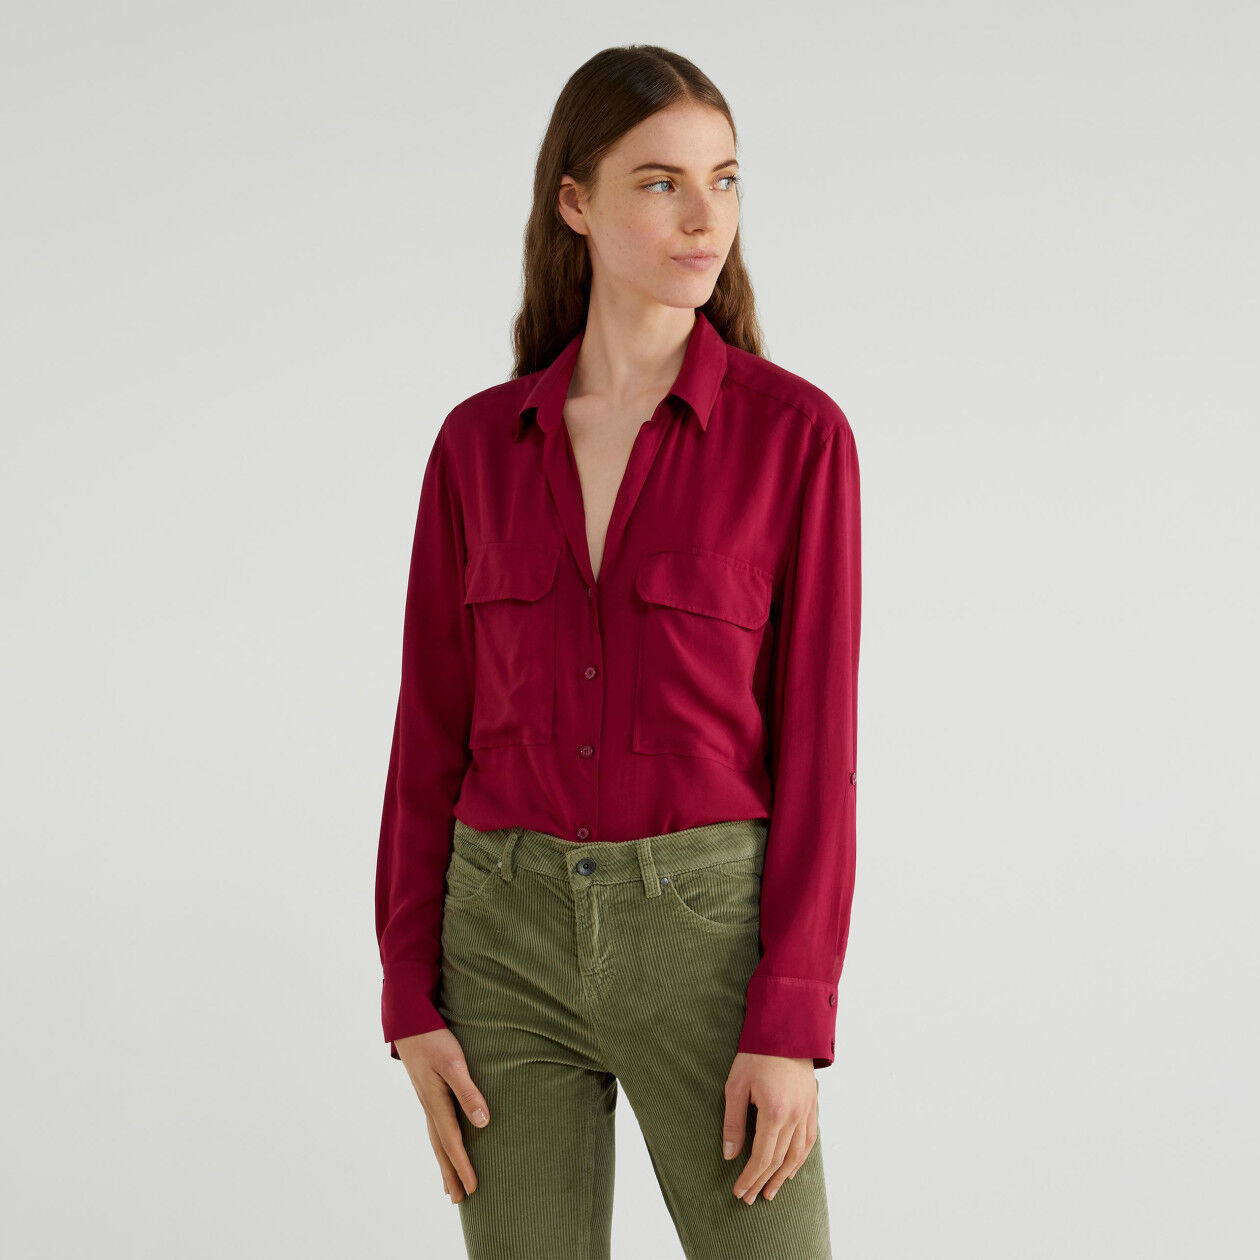 Flowy shirt with pockets